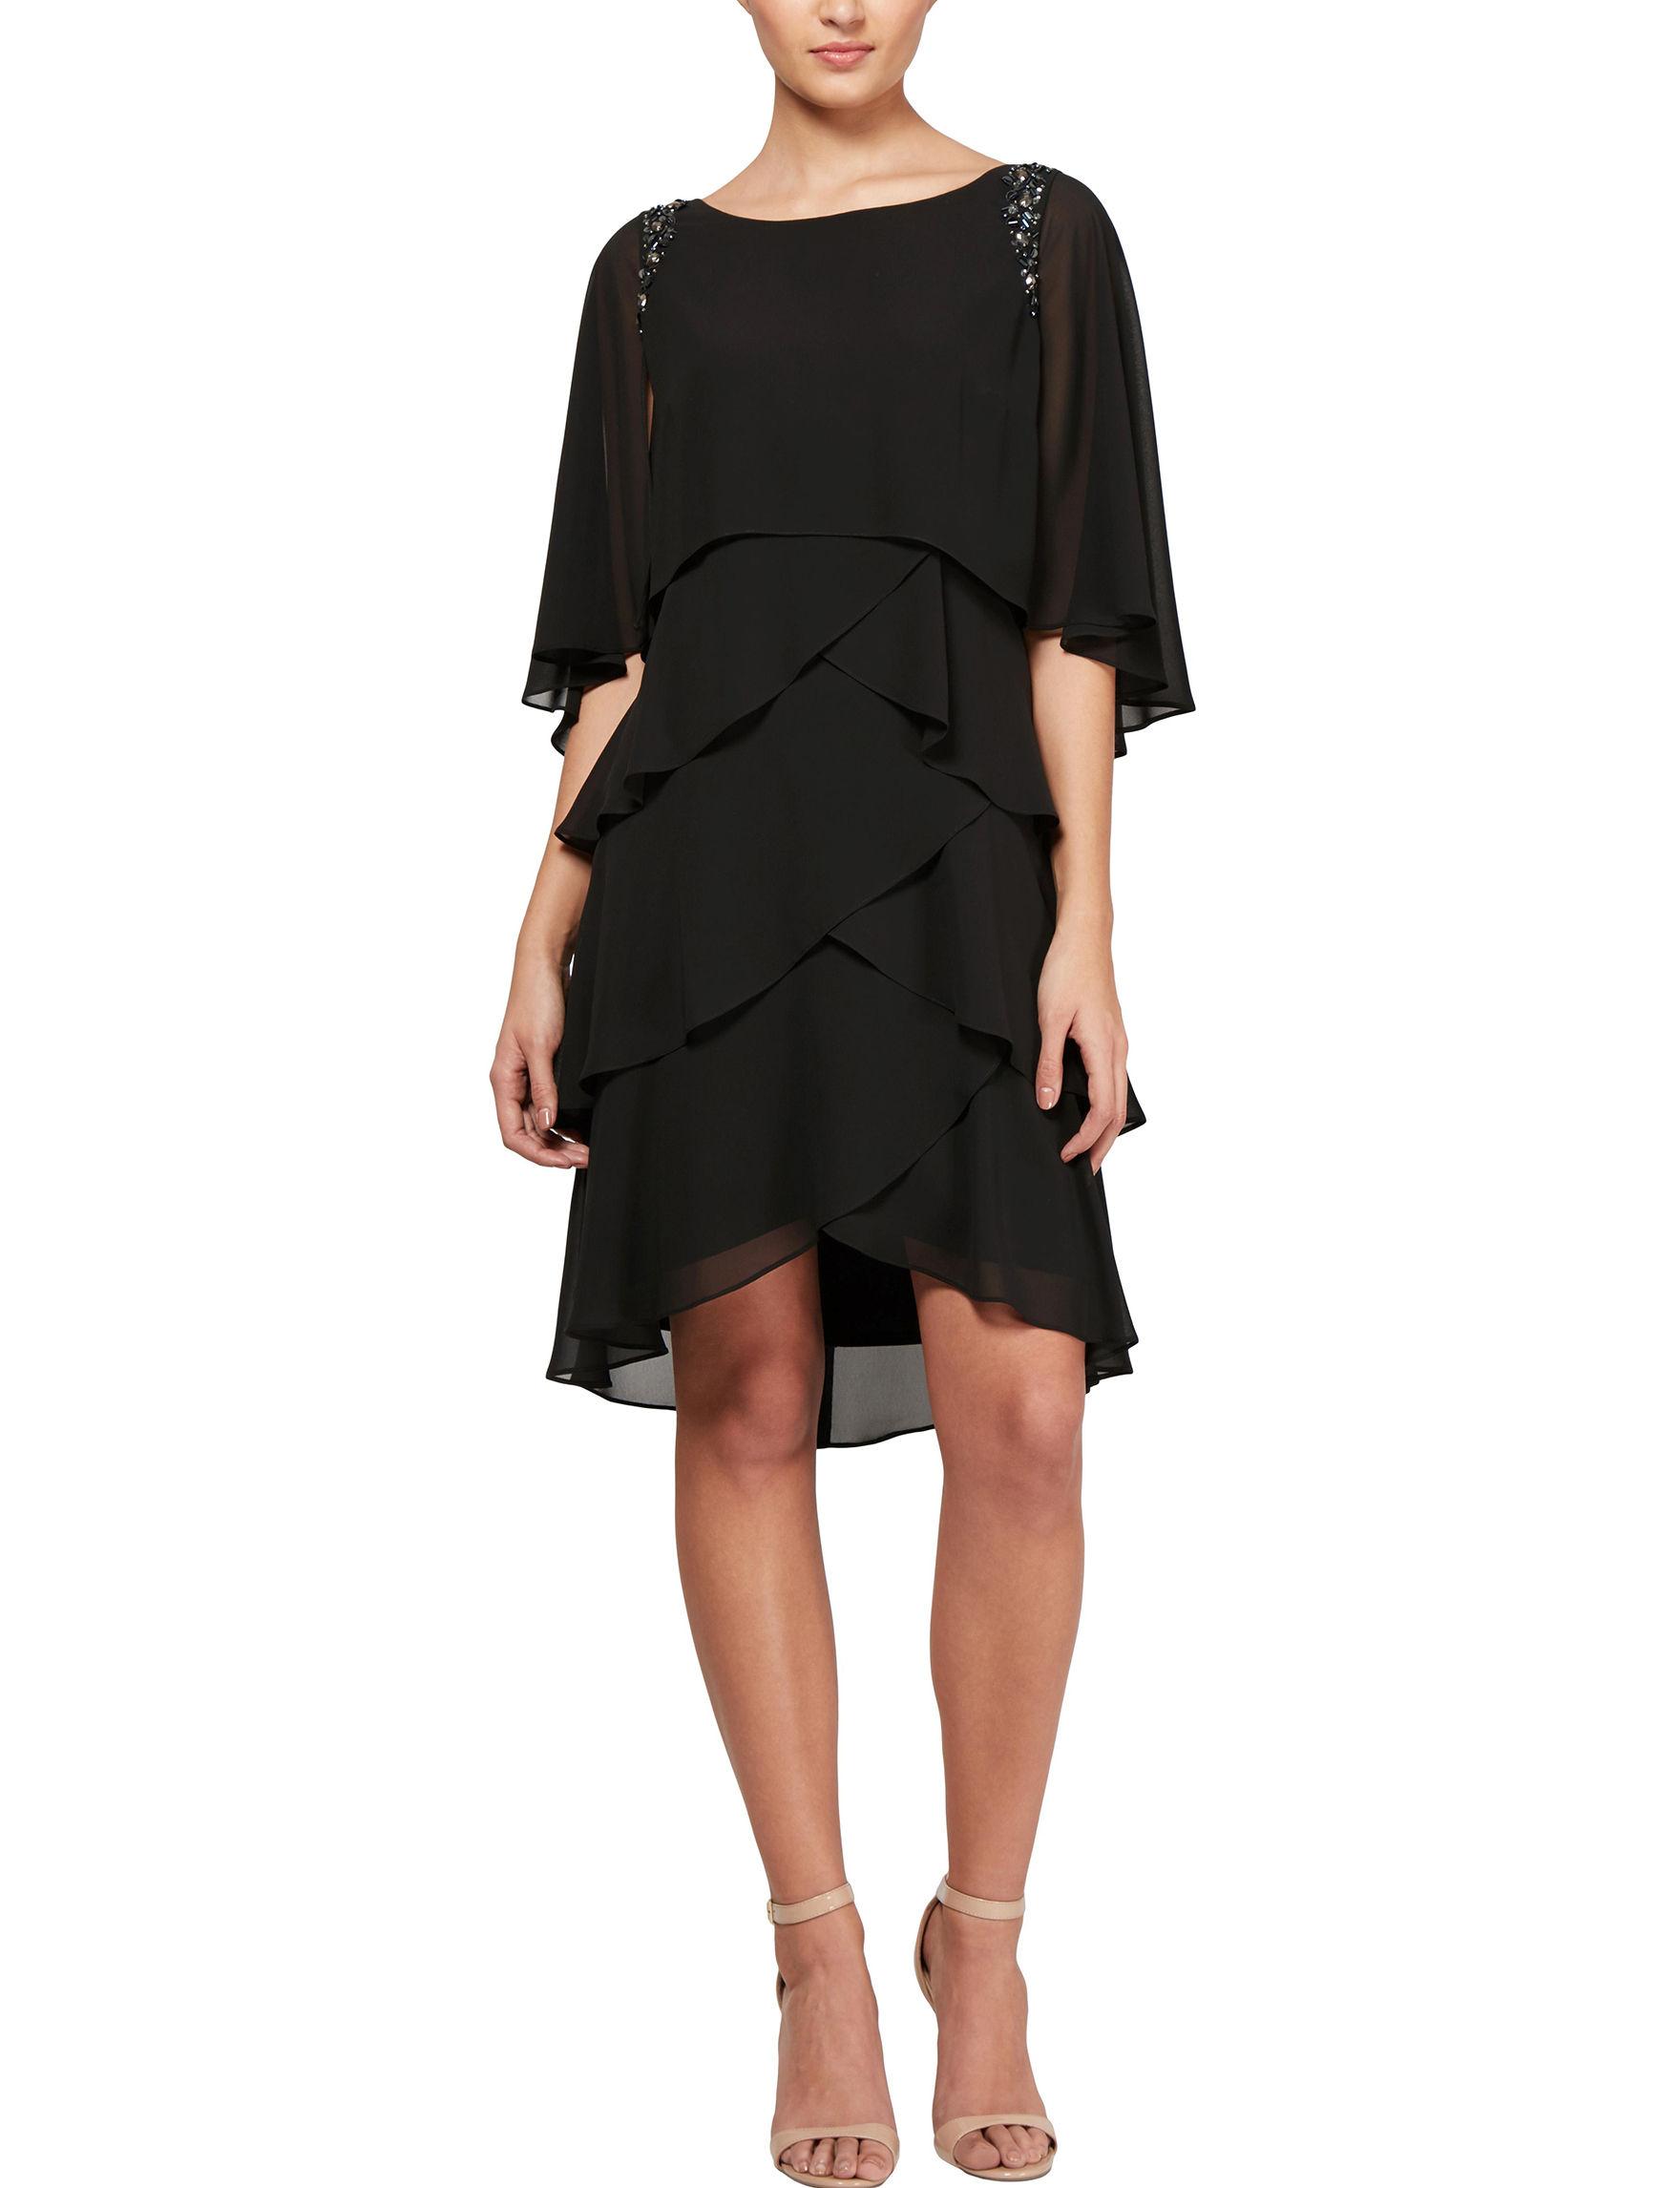 S.L. Fashions Black Cocktail & Party Evening & Formal Jacket Dresses